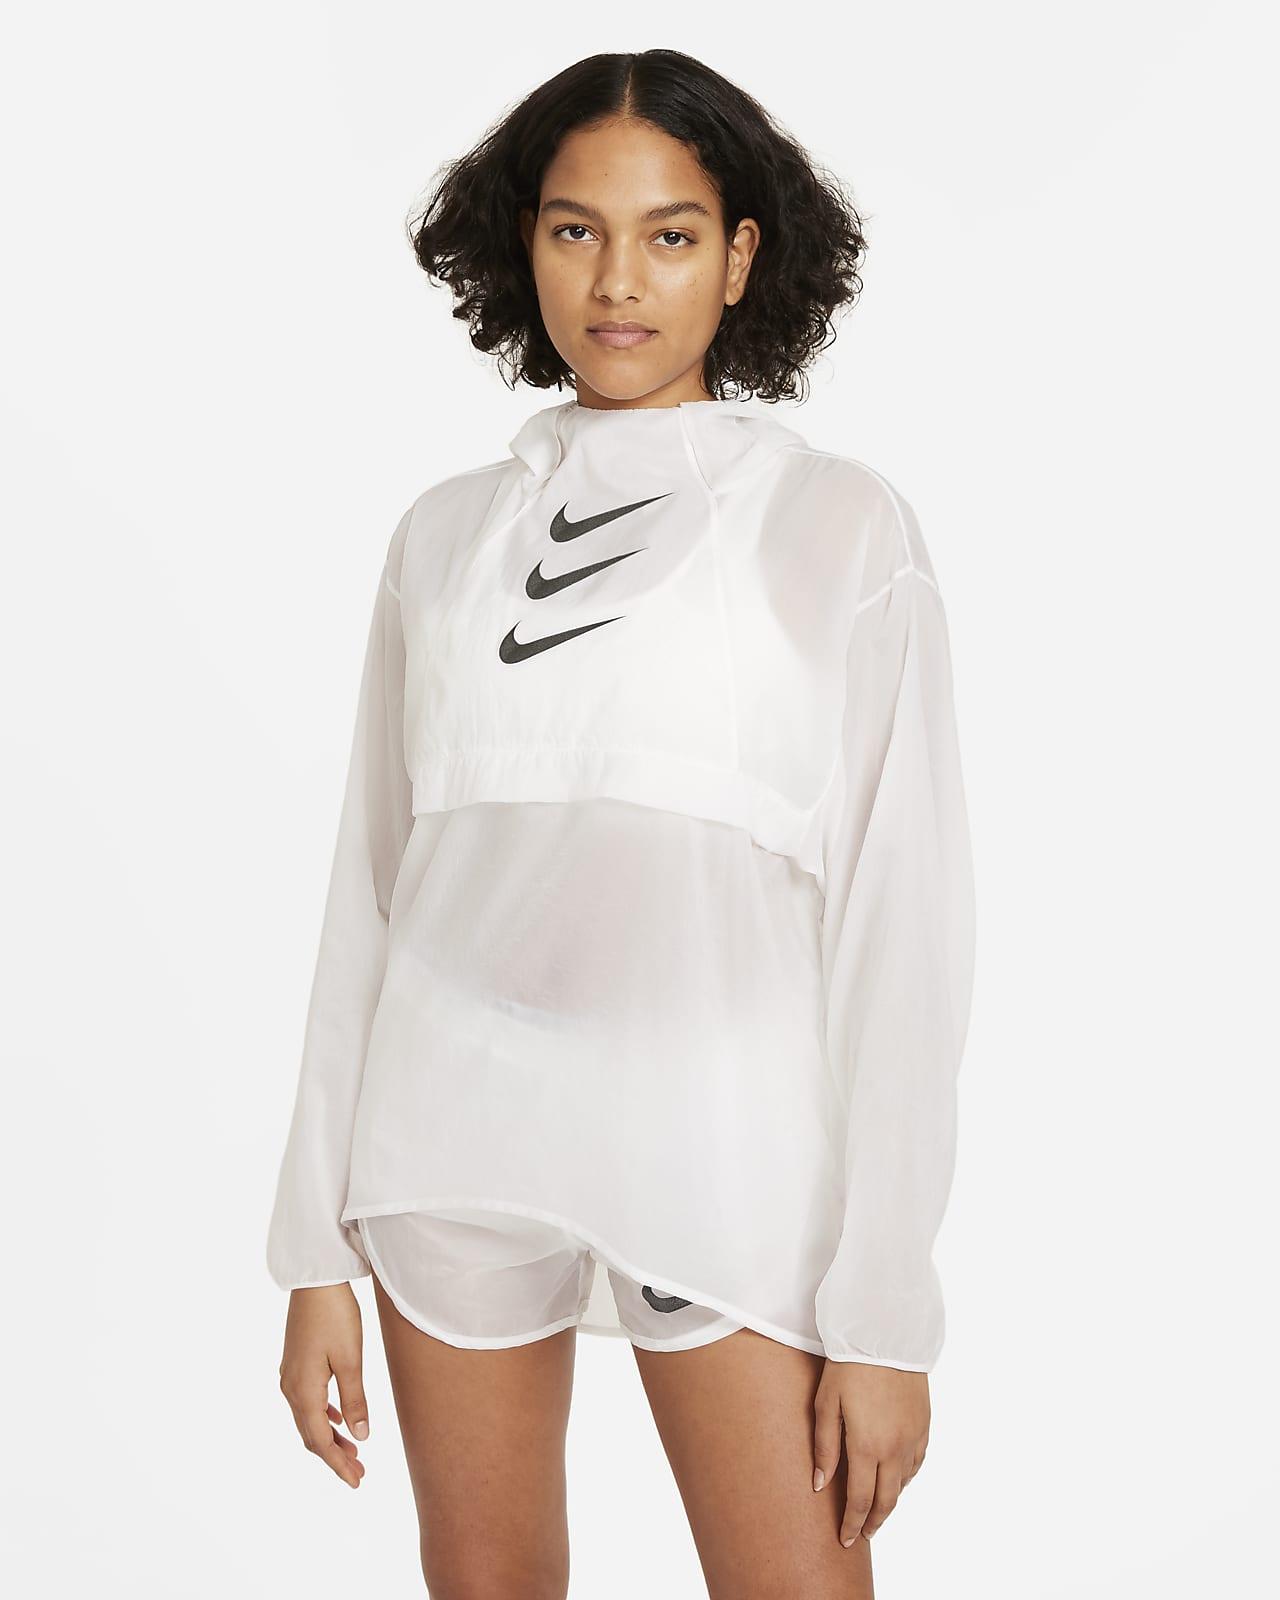 Nike Run Division Women's Packable Running Jacket